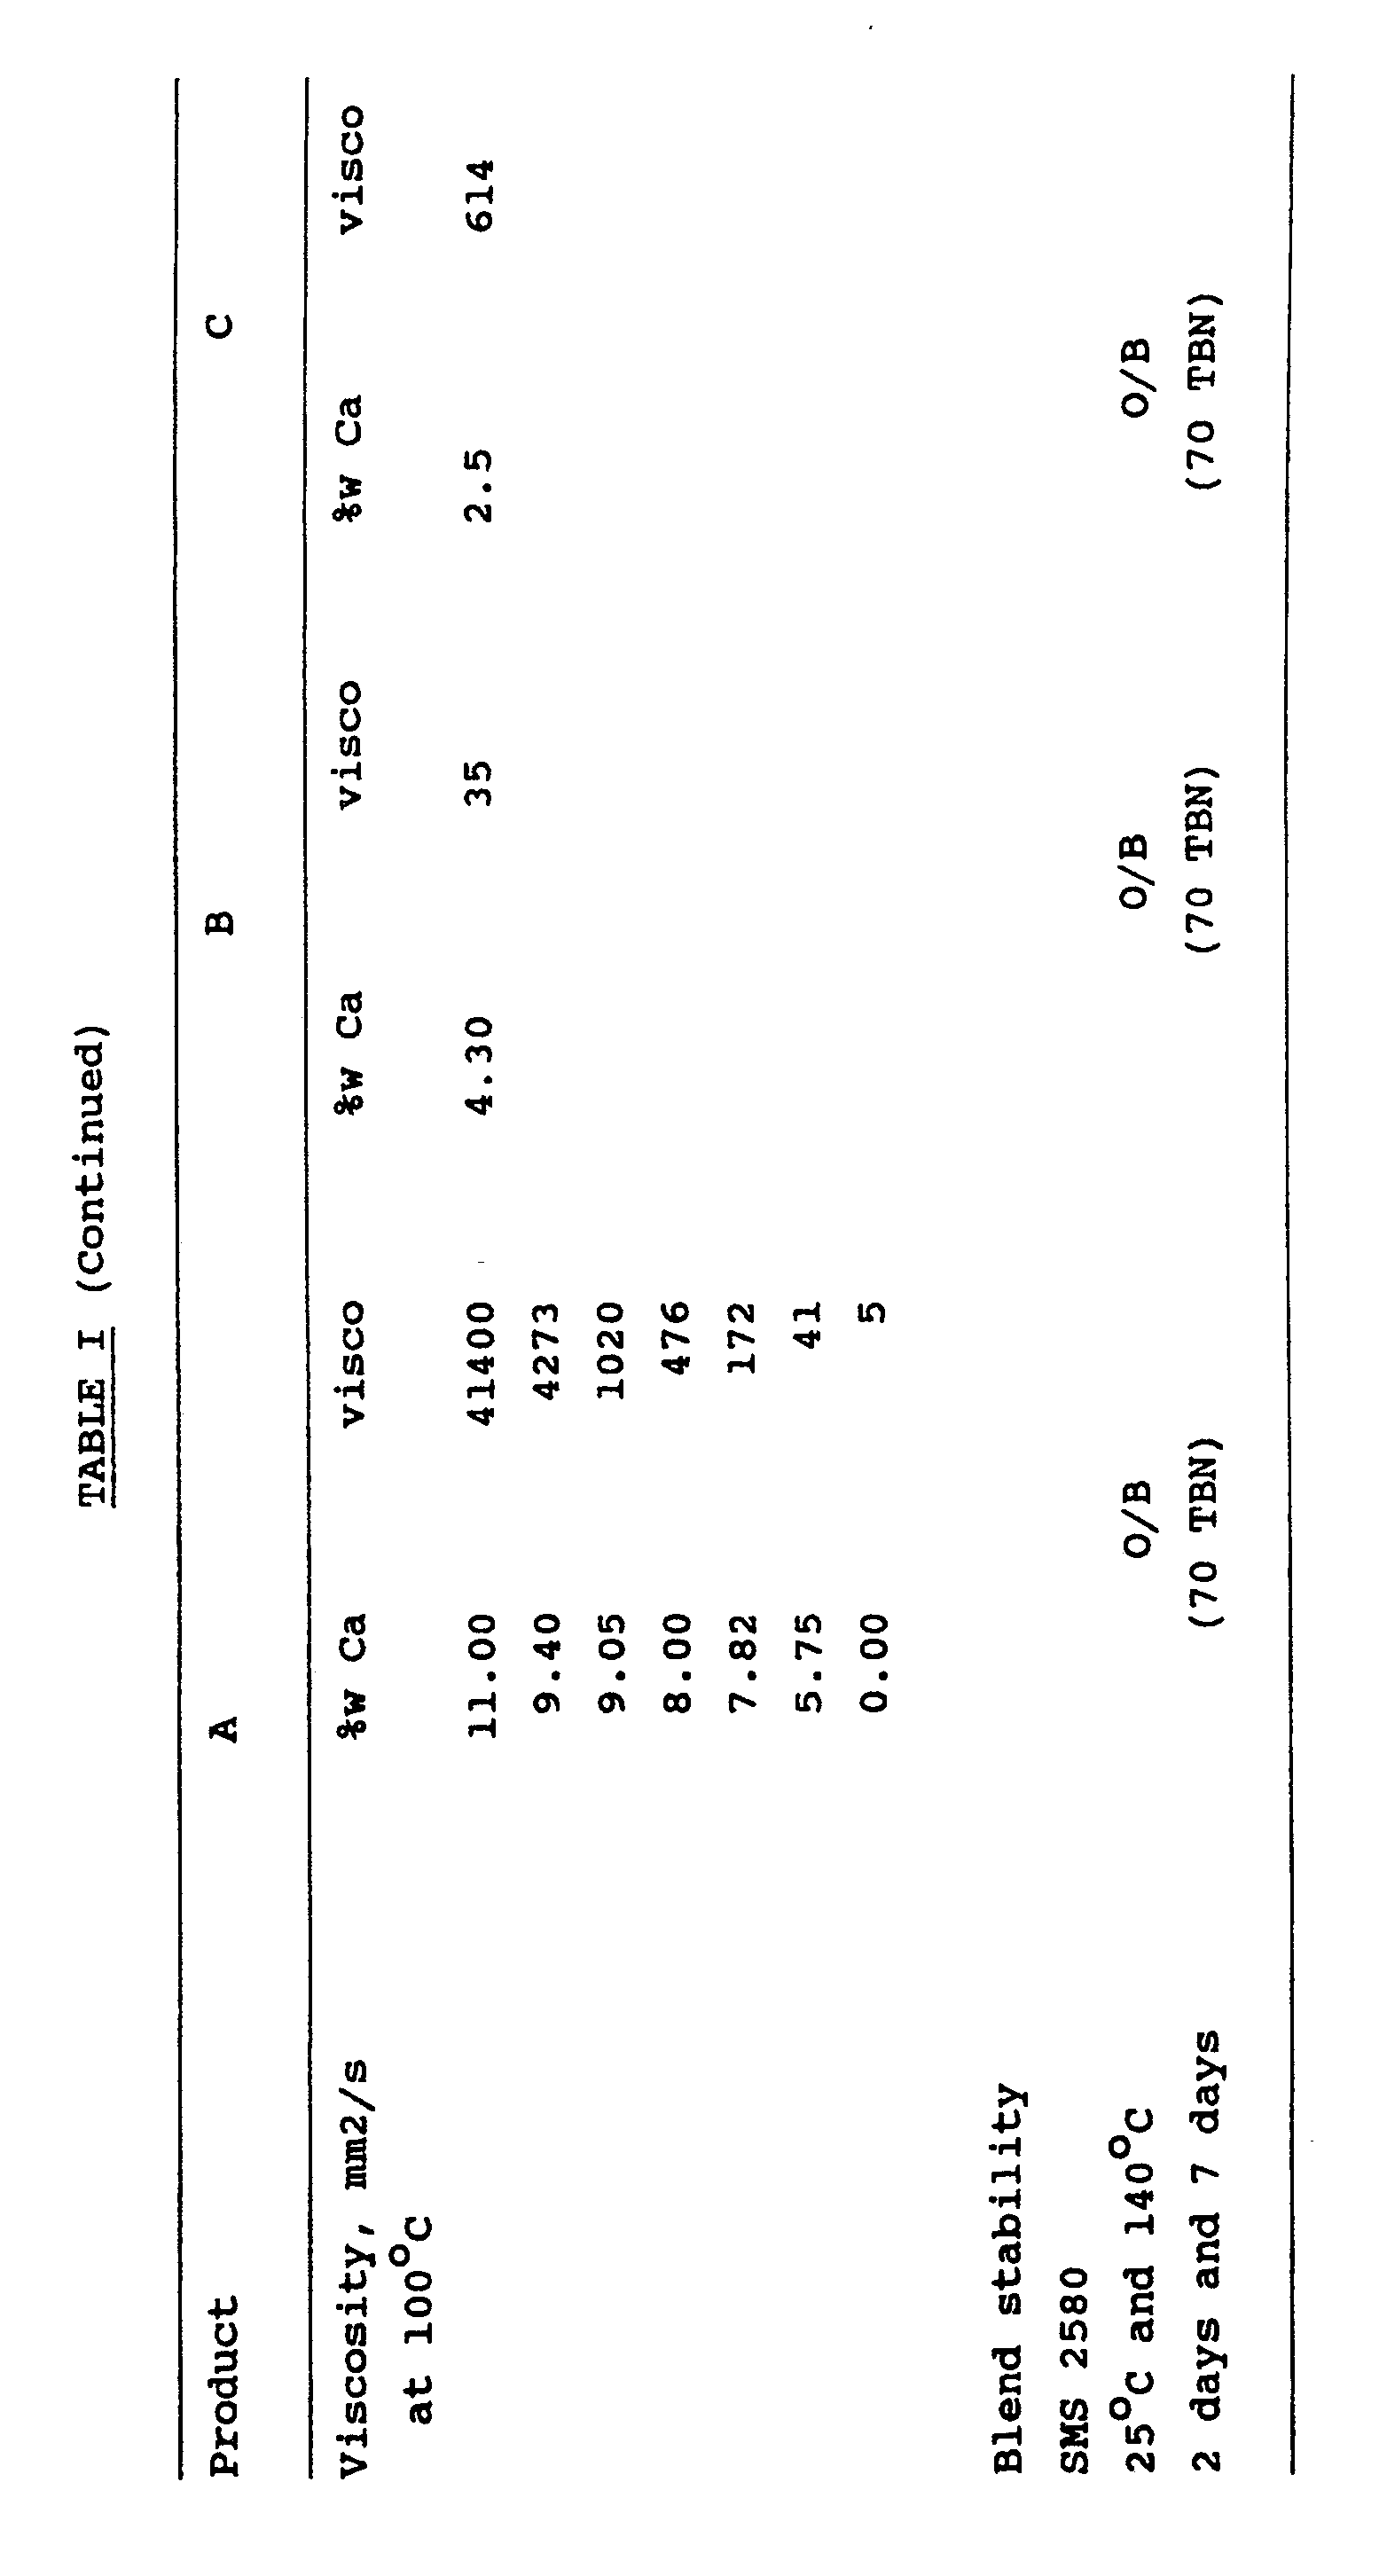 专利ep0372651a2 - succinic